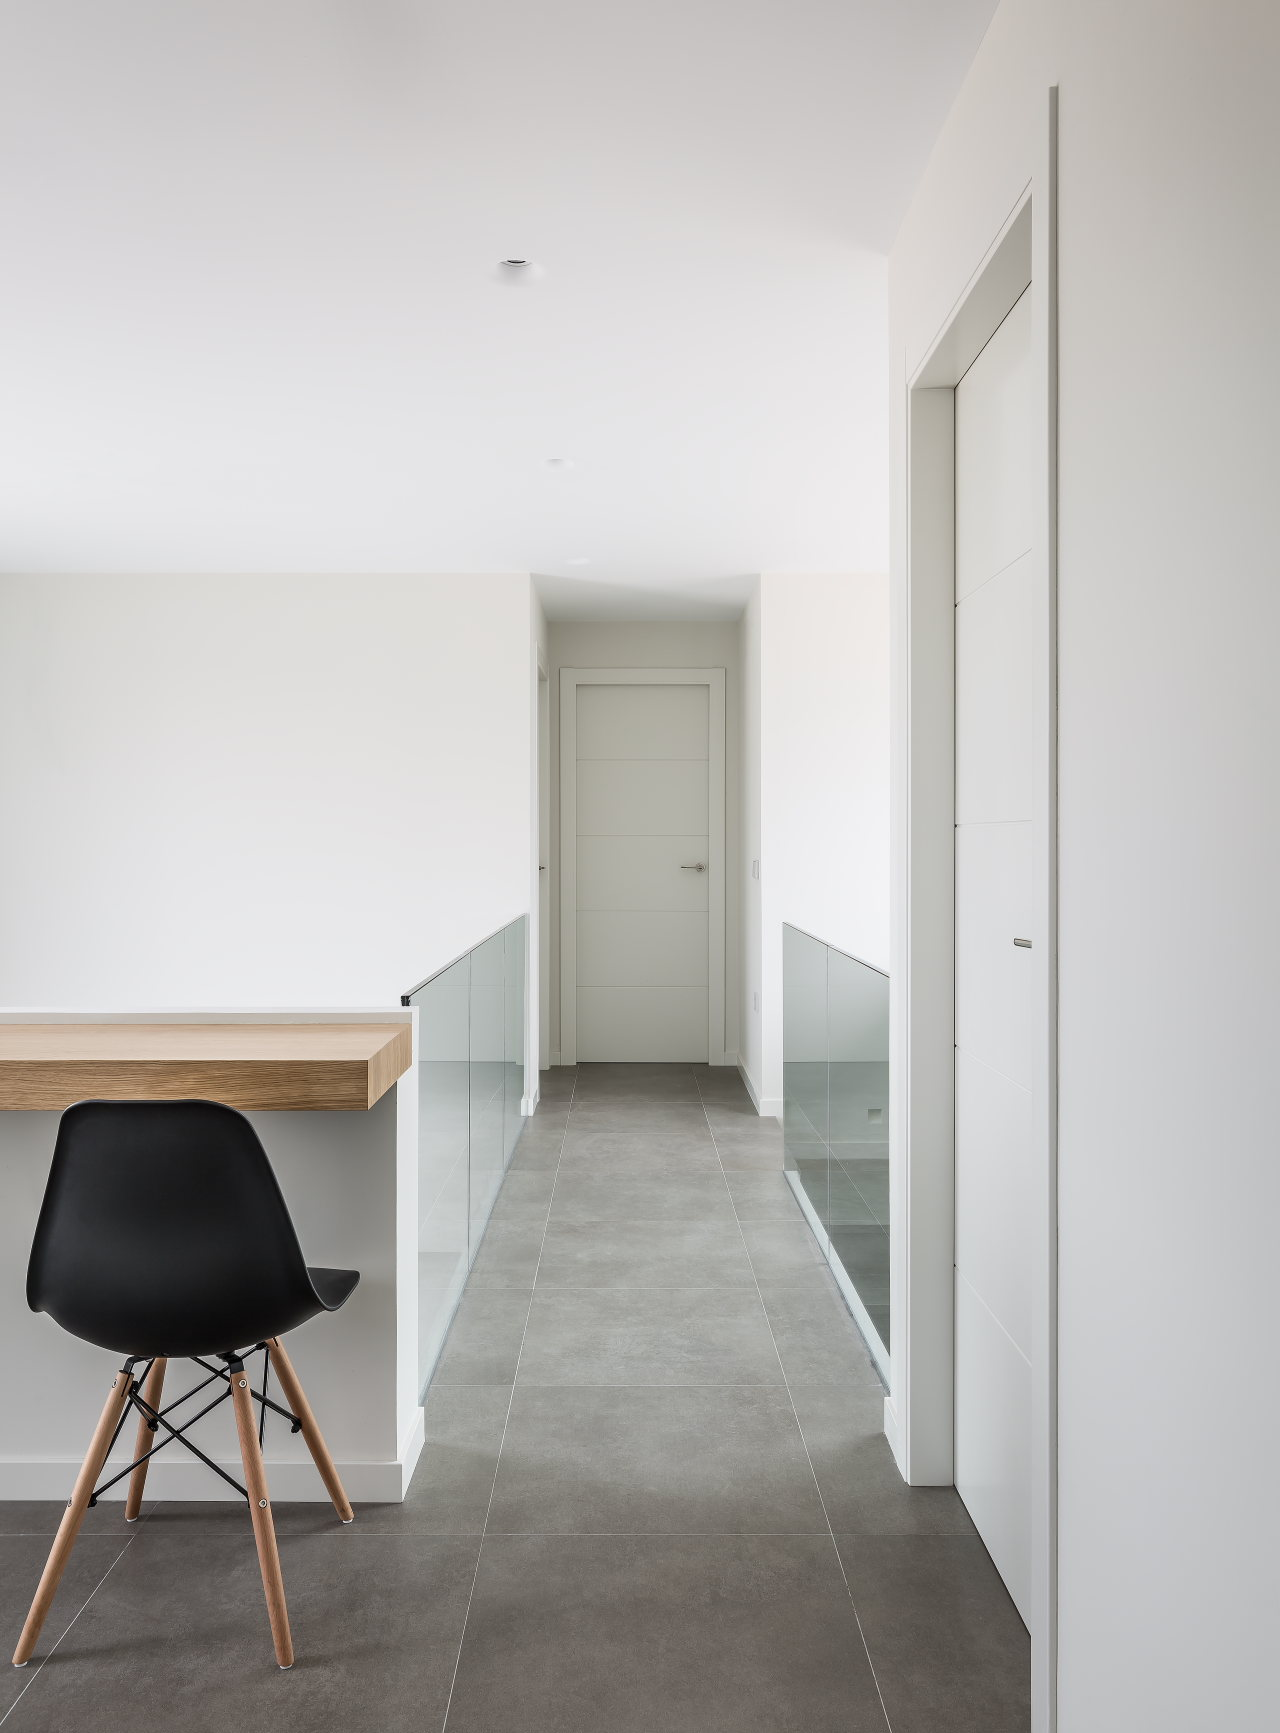 fotografia-arquitectura-valencia-german-cabo-viraje-san-antonio (23)